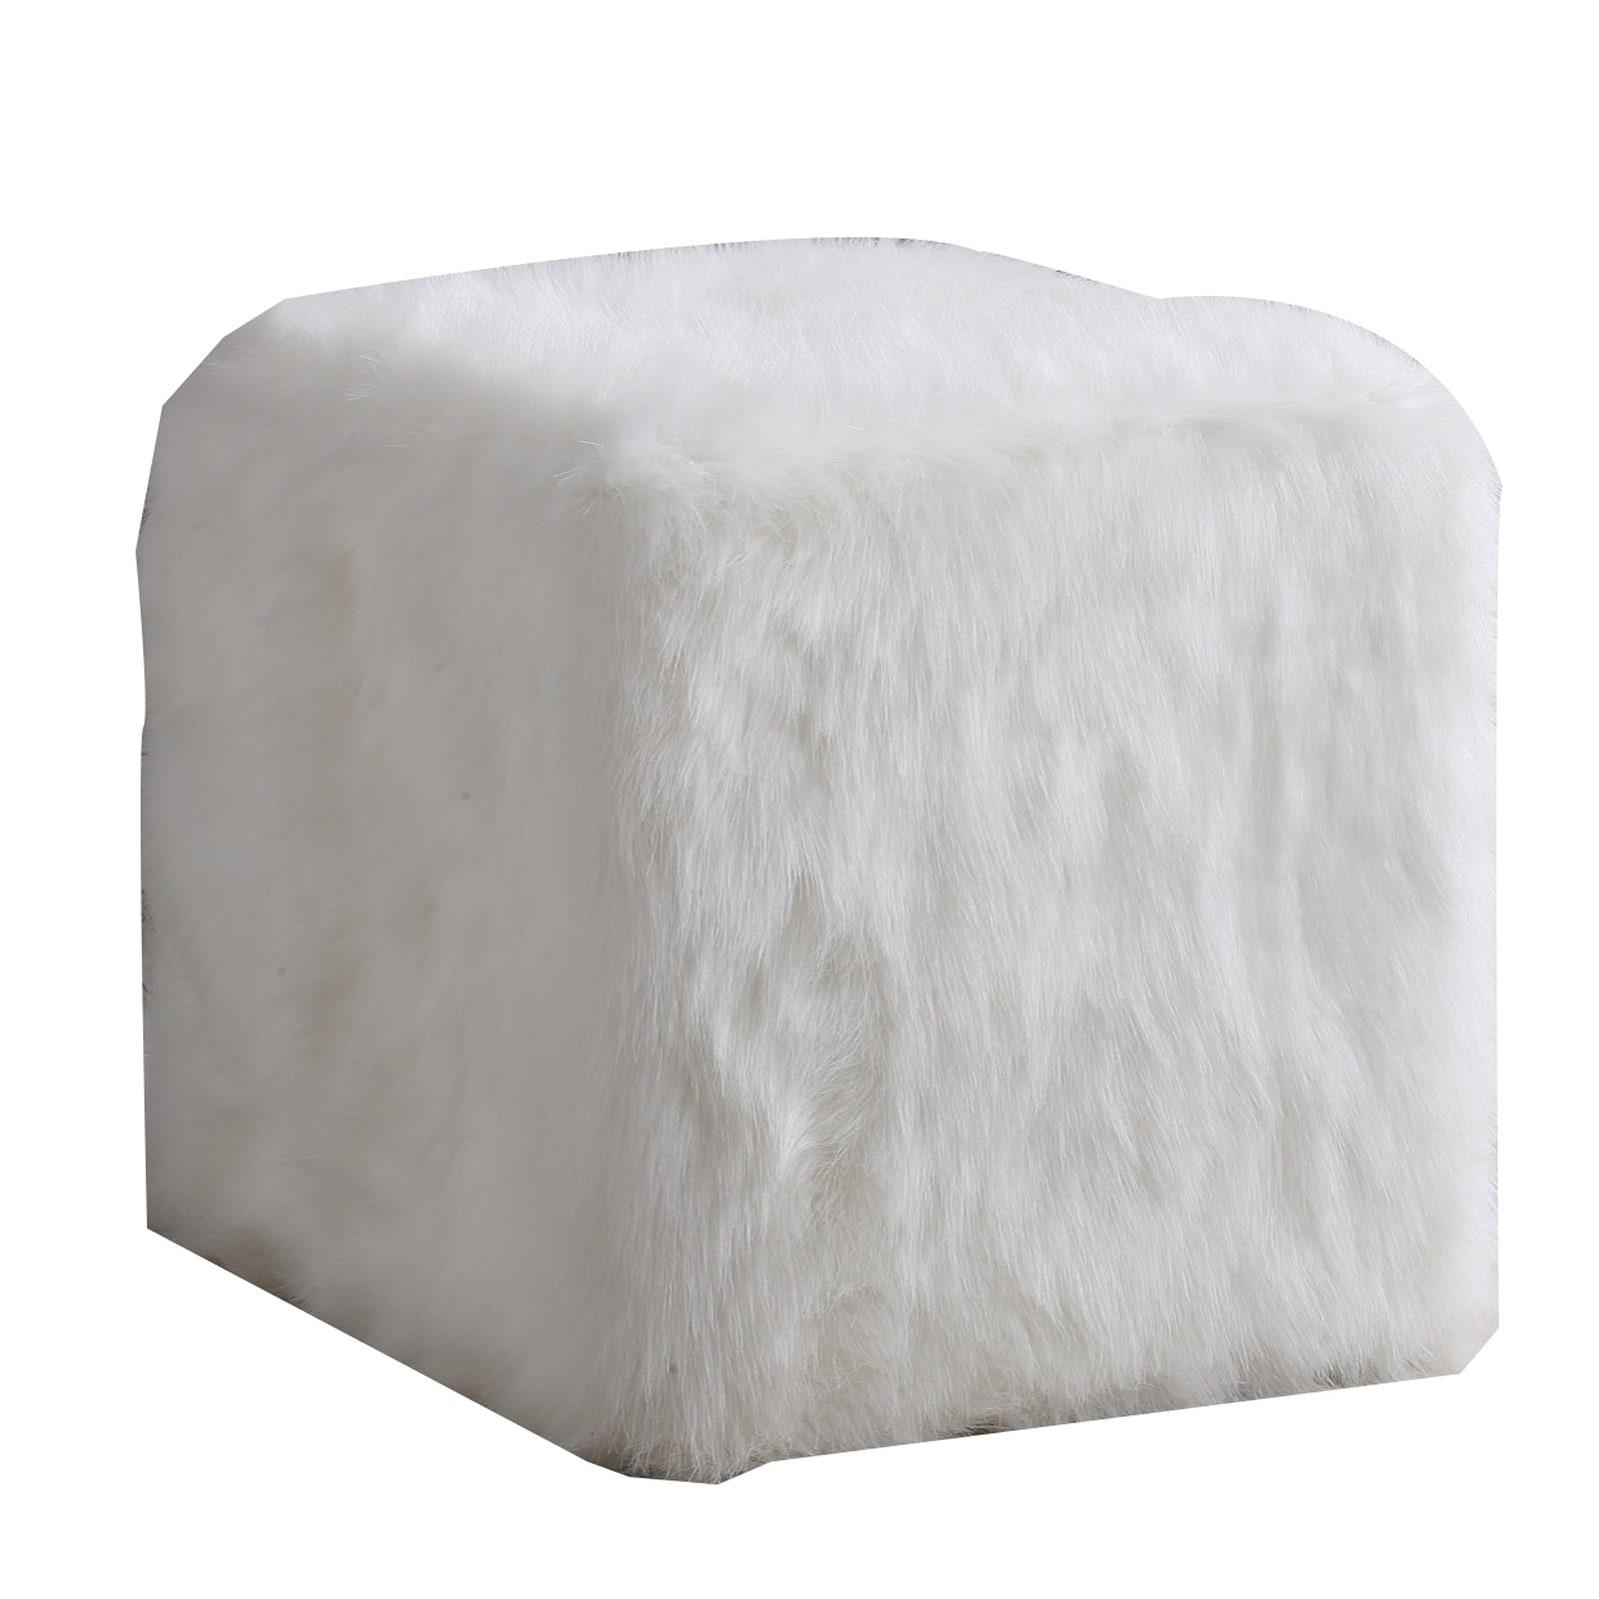 Enjoyable Faux Fur Upholstered Wooden Ottoman In Cube Shape White Creativecarmelina Interior Chair Design Creativecarmelinacom